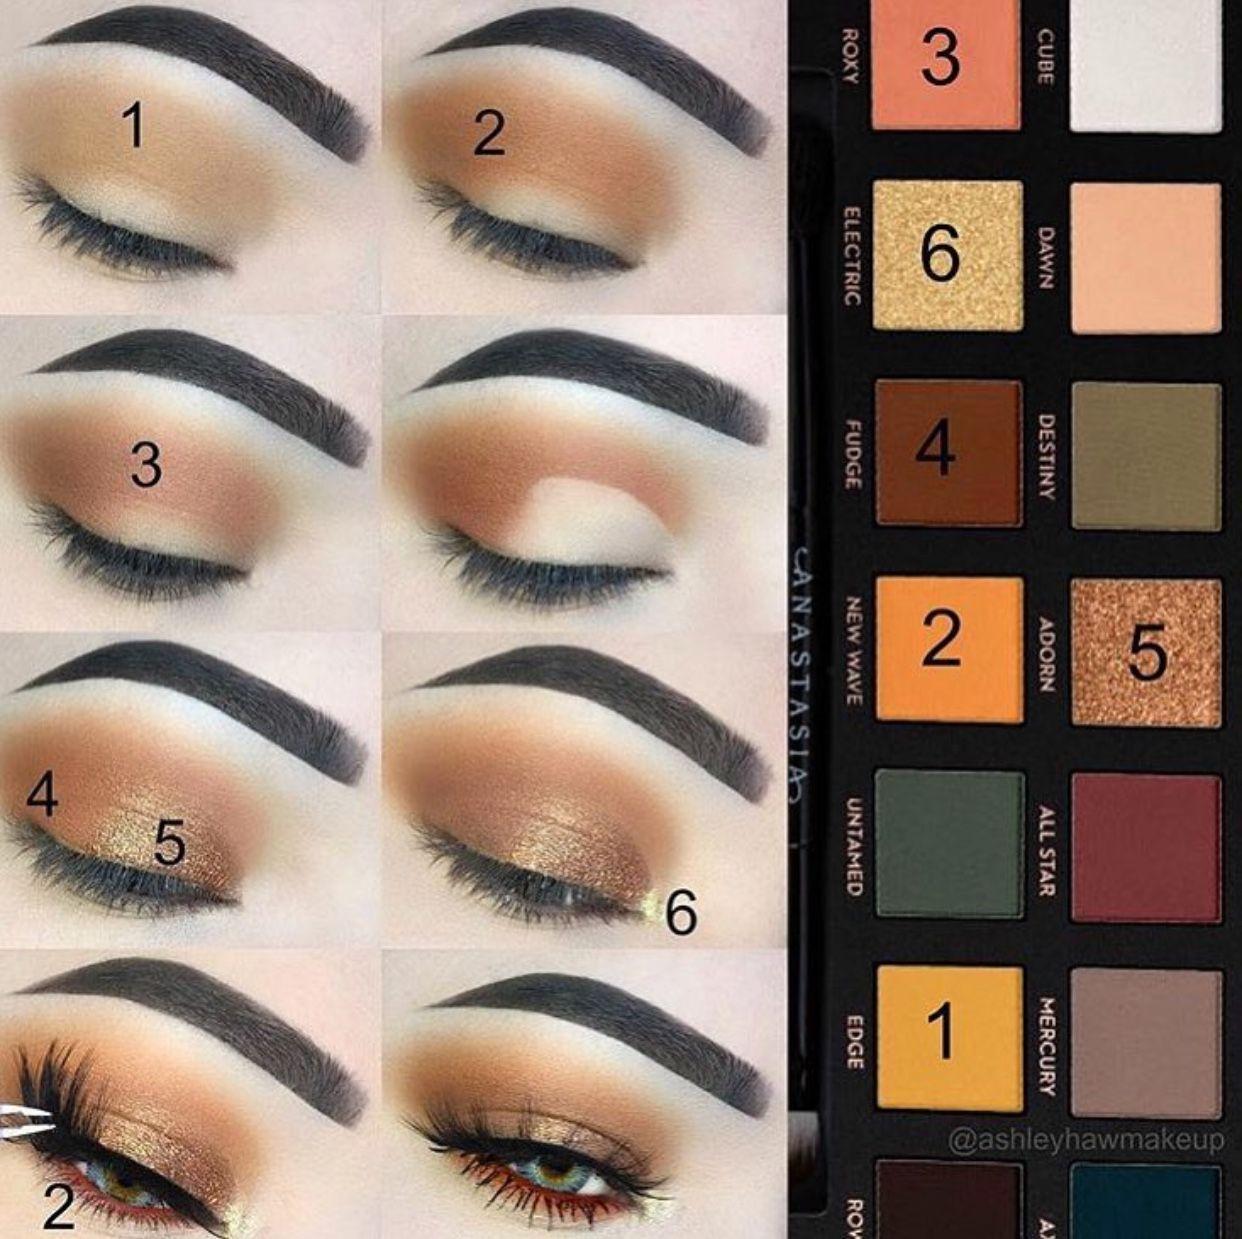 Pin by xίʍεηα on sombras pinterest makeup eye and eyeshadow